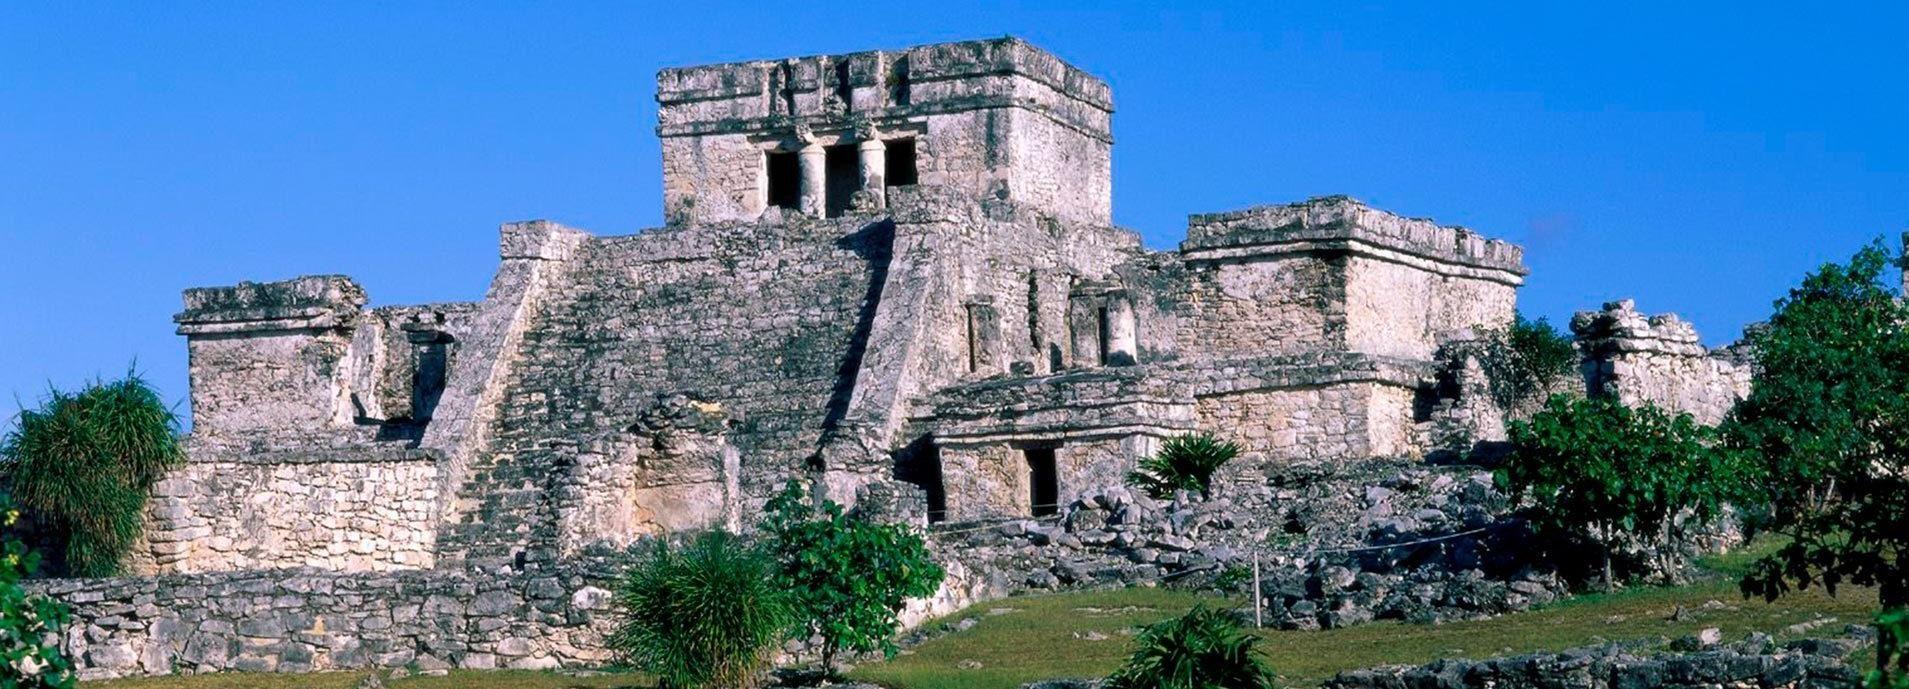 Von Playa del Carmen: Tulum Ruins & Jungle Maya Park Tour